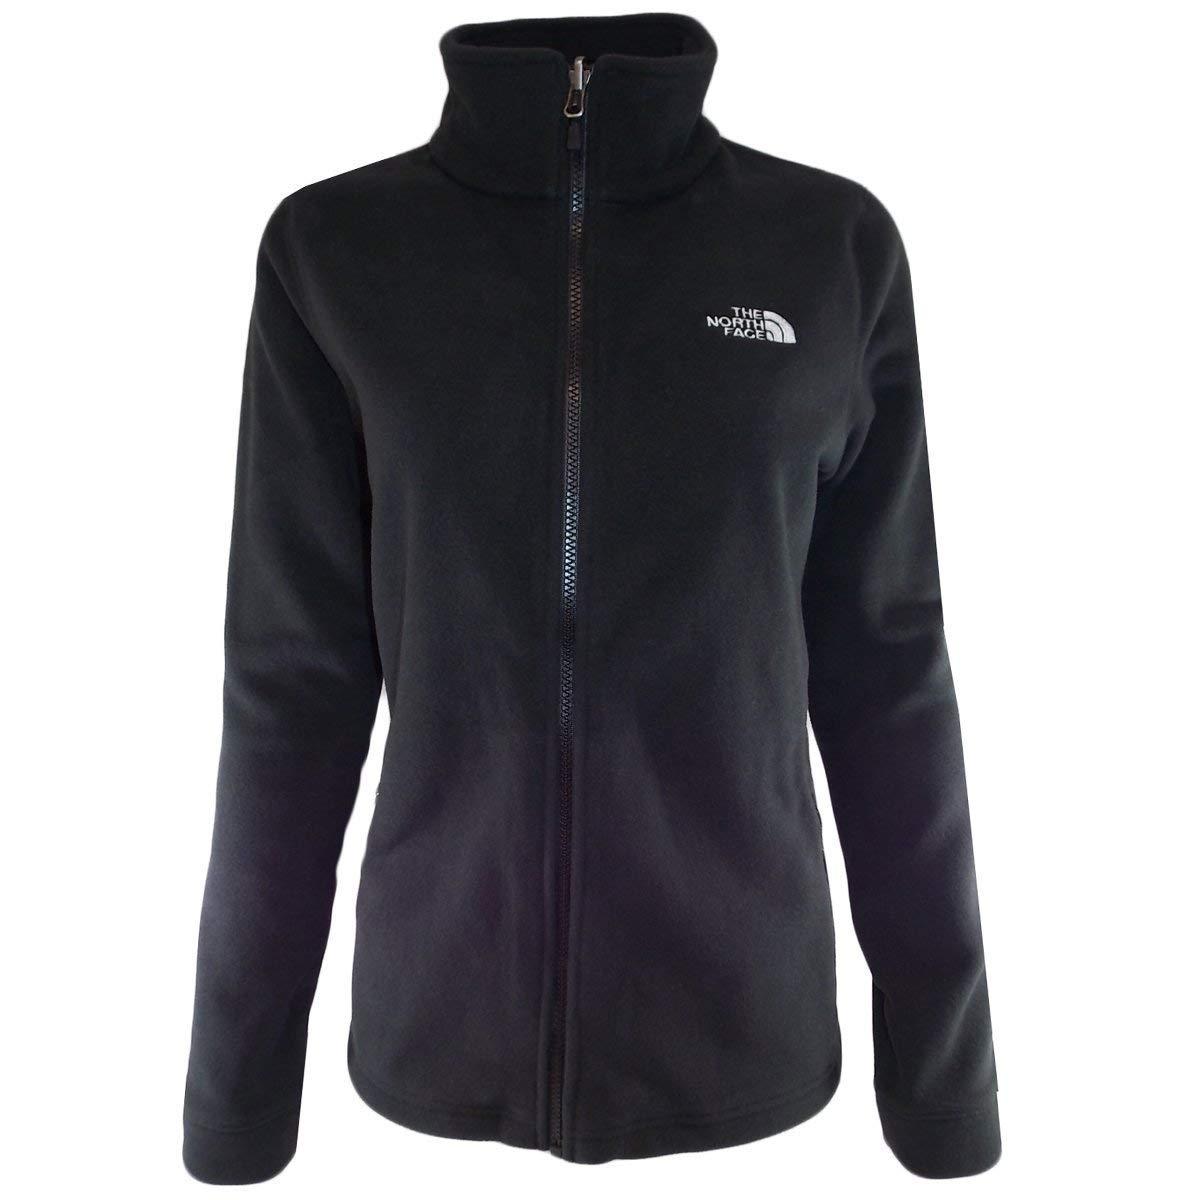 68d4c93312e The North Face Women's Black 300 Tundra Full-Zip Fleece Jacket at Amazon  Women's Coats Shop